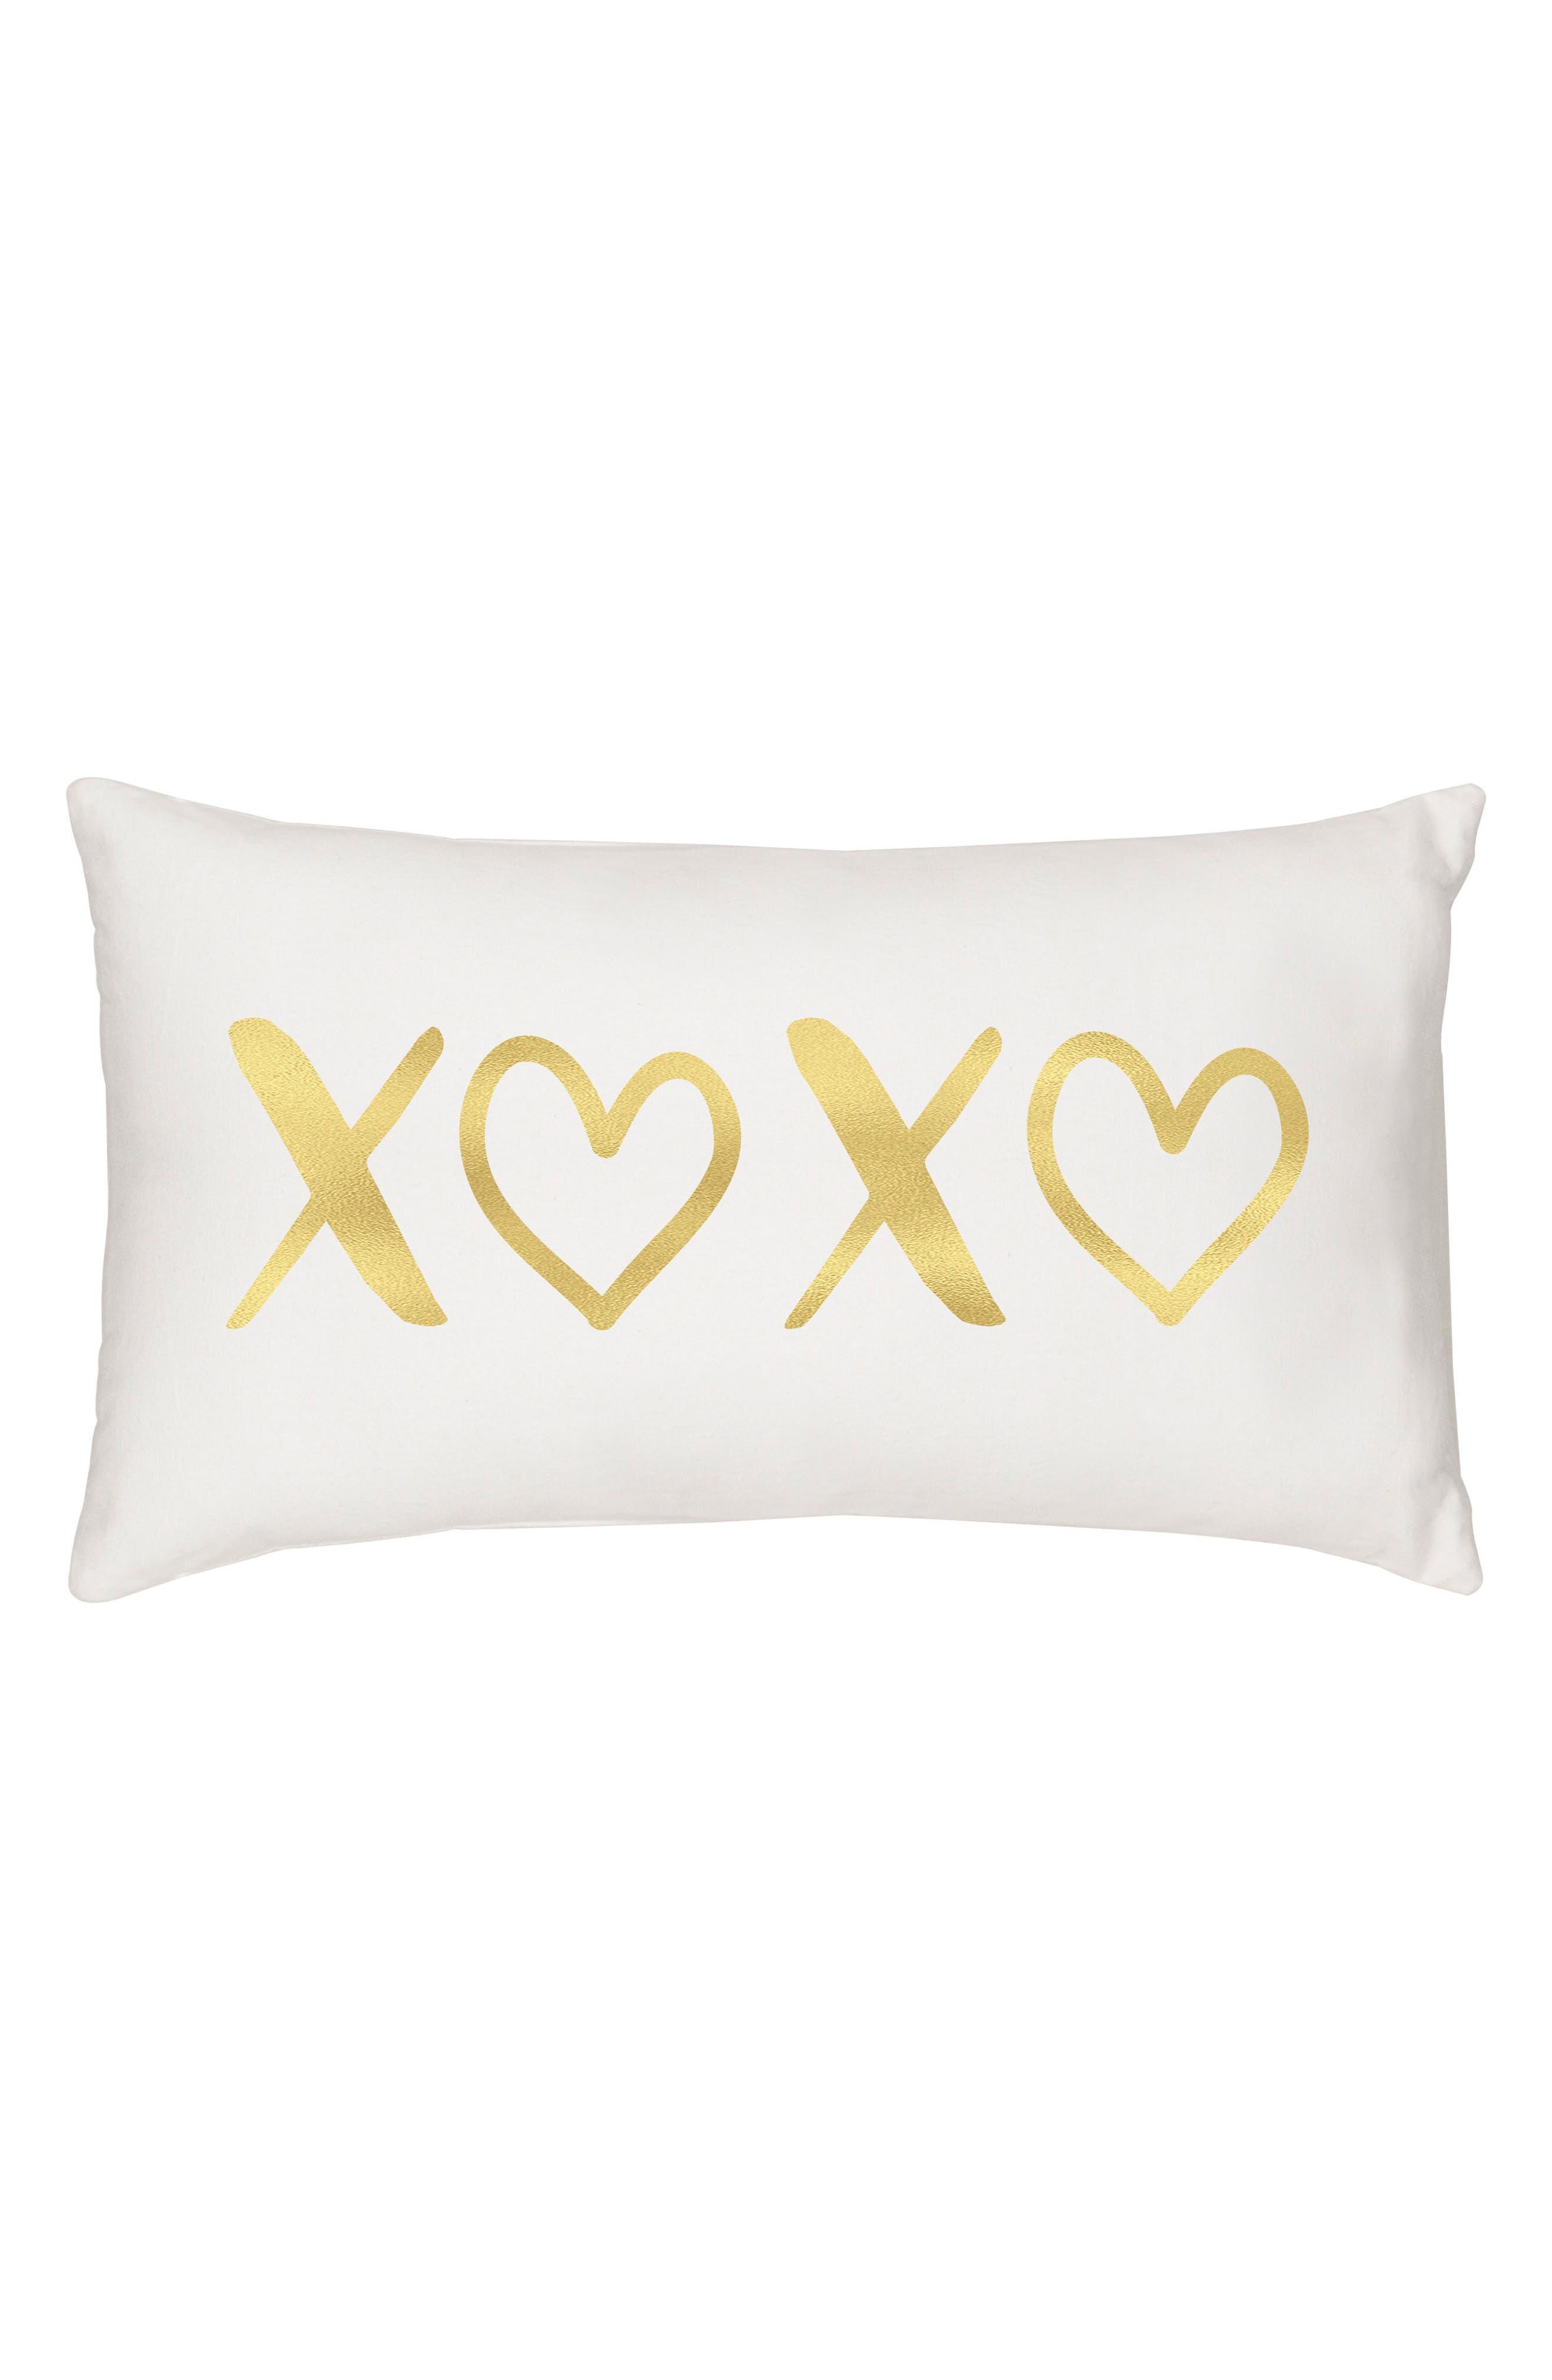 XOXO Accent Pillow,                         Main,                         color, 713